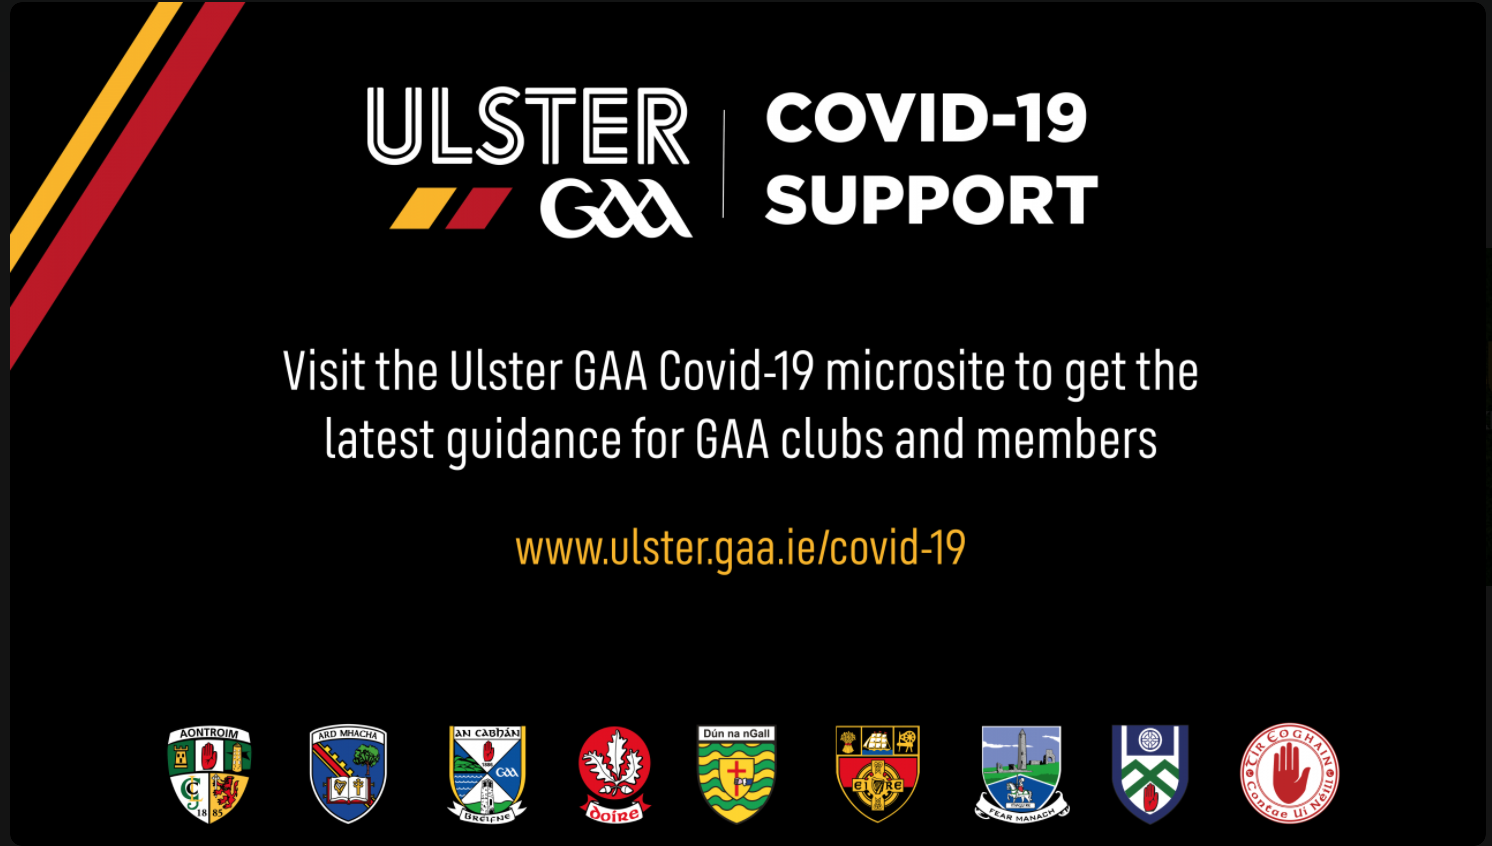 Ulster GAA provide six county clarification on Covid-19 variances